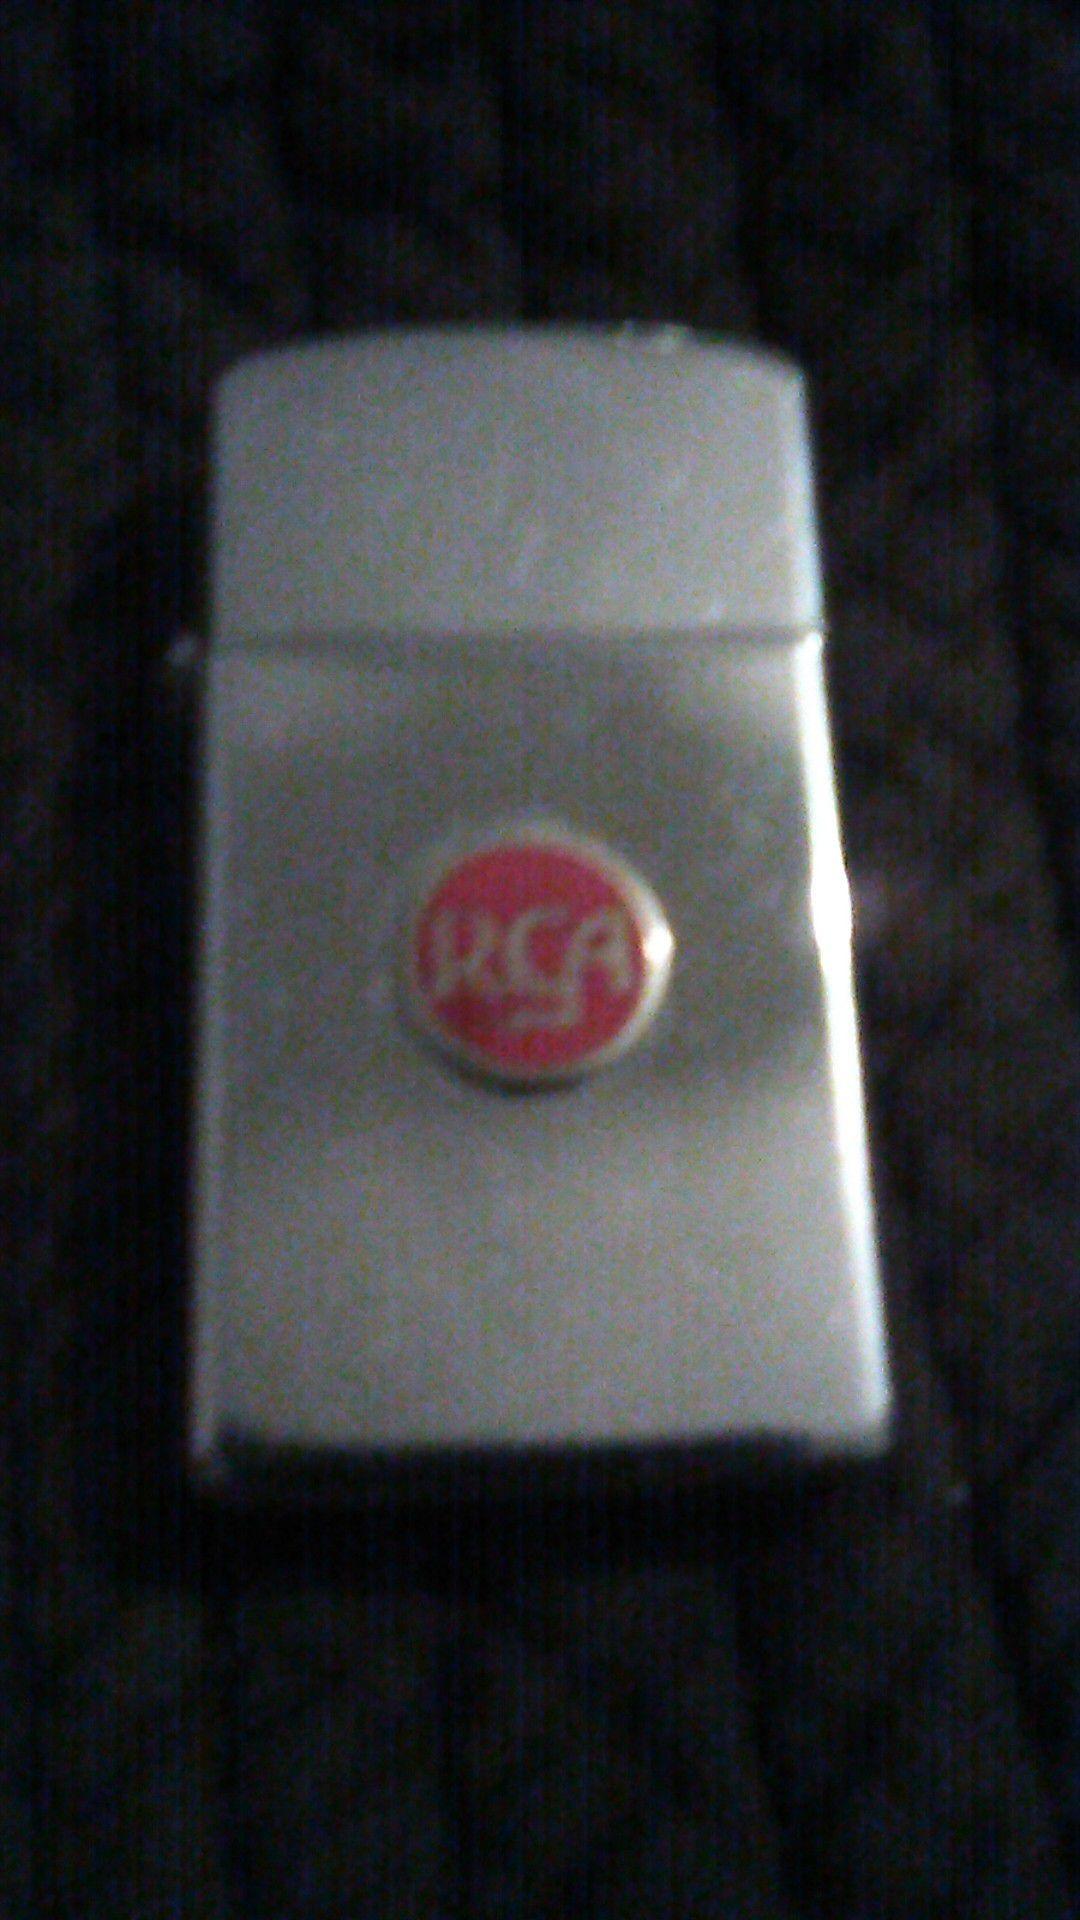 1947 RCA ZIPPO LIGHTER PAT#2517191